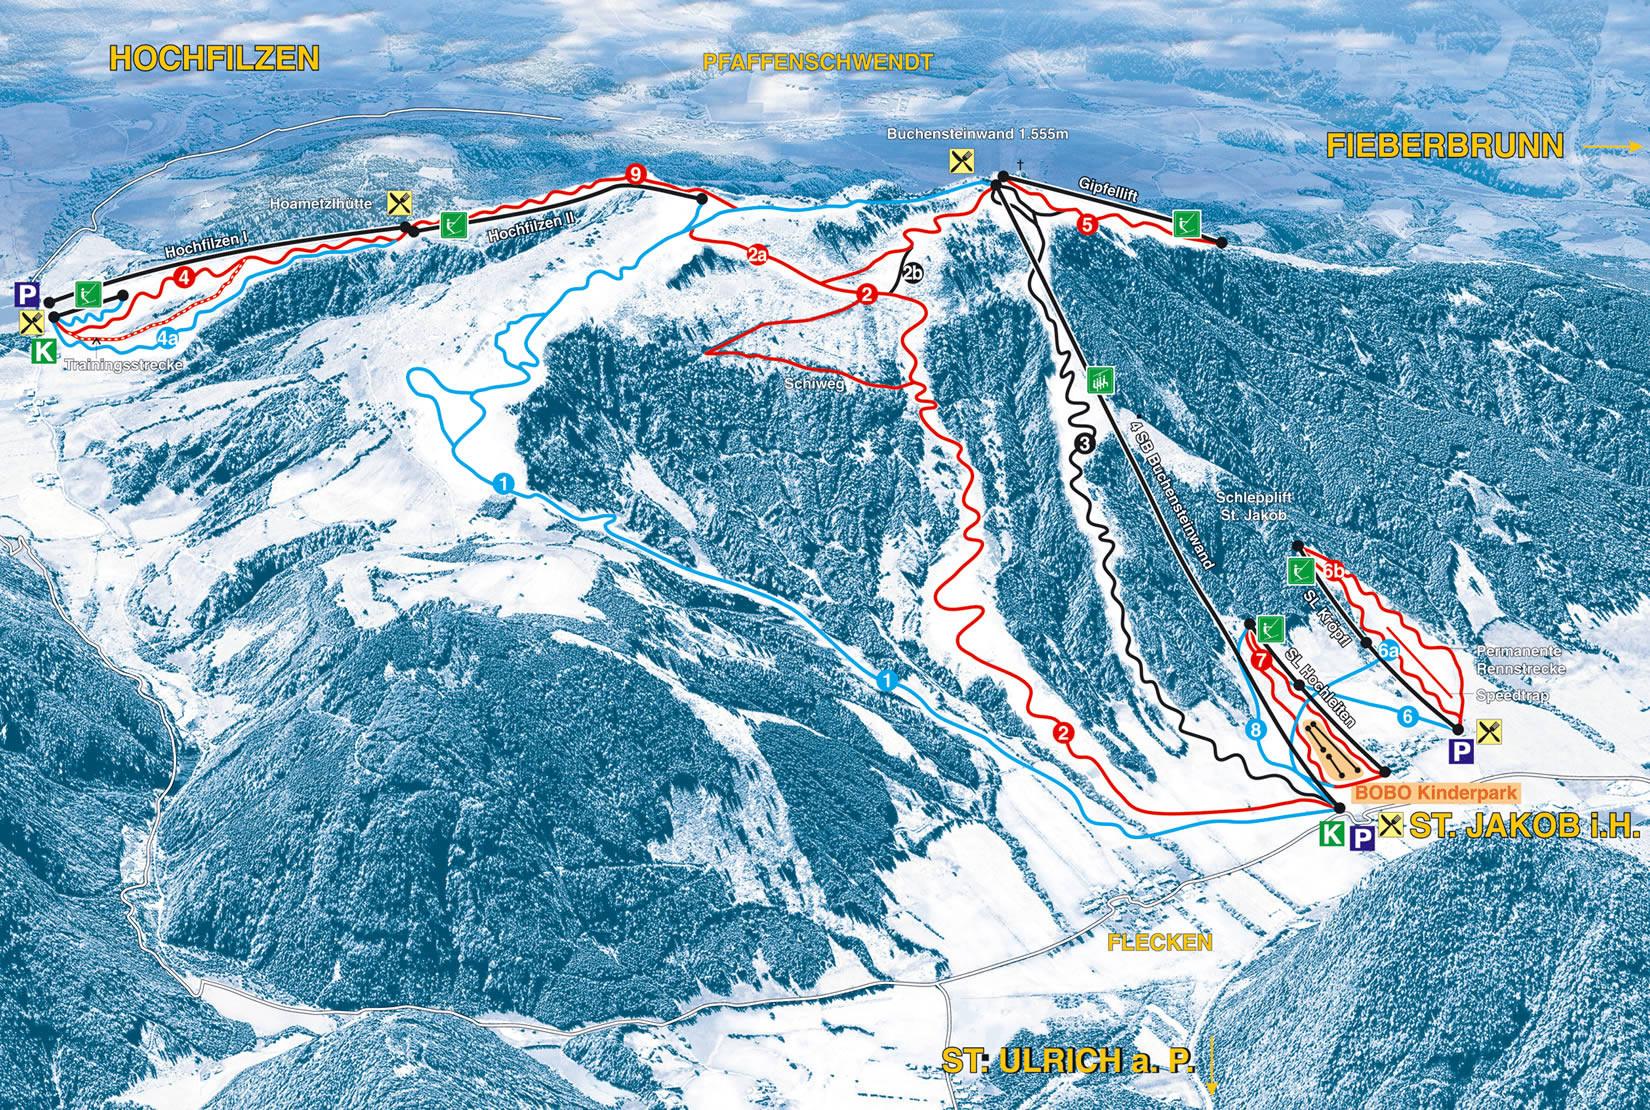 Lyžařská mapa sjezdovek areálu Pillersee - Buchensteinwand